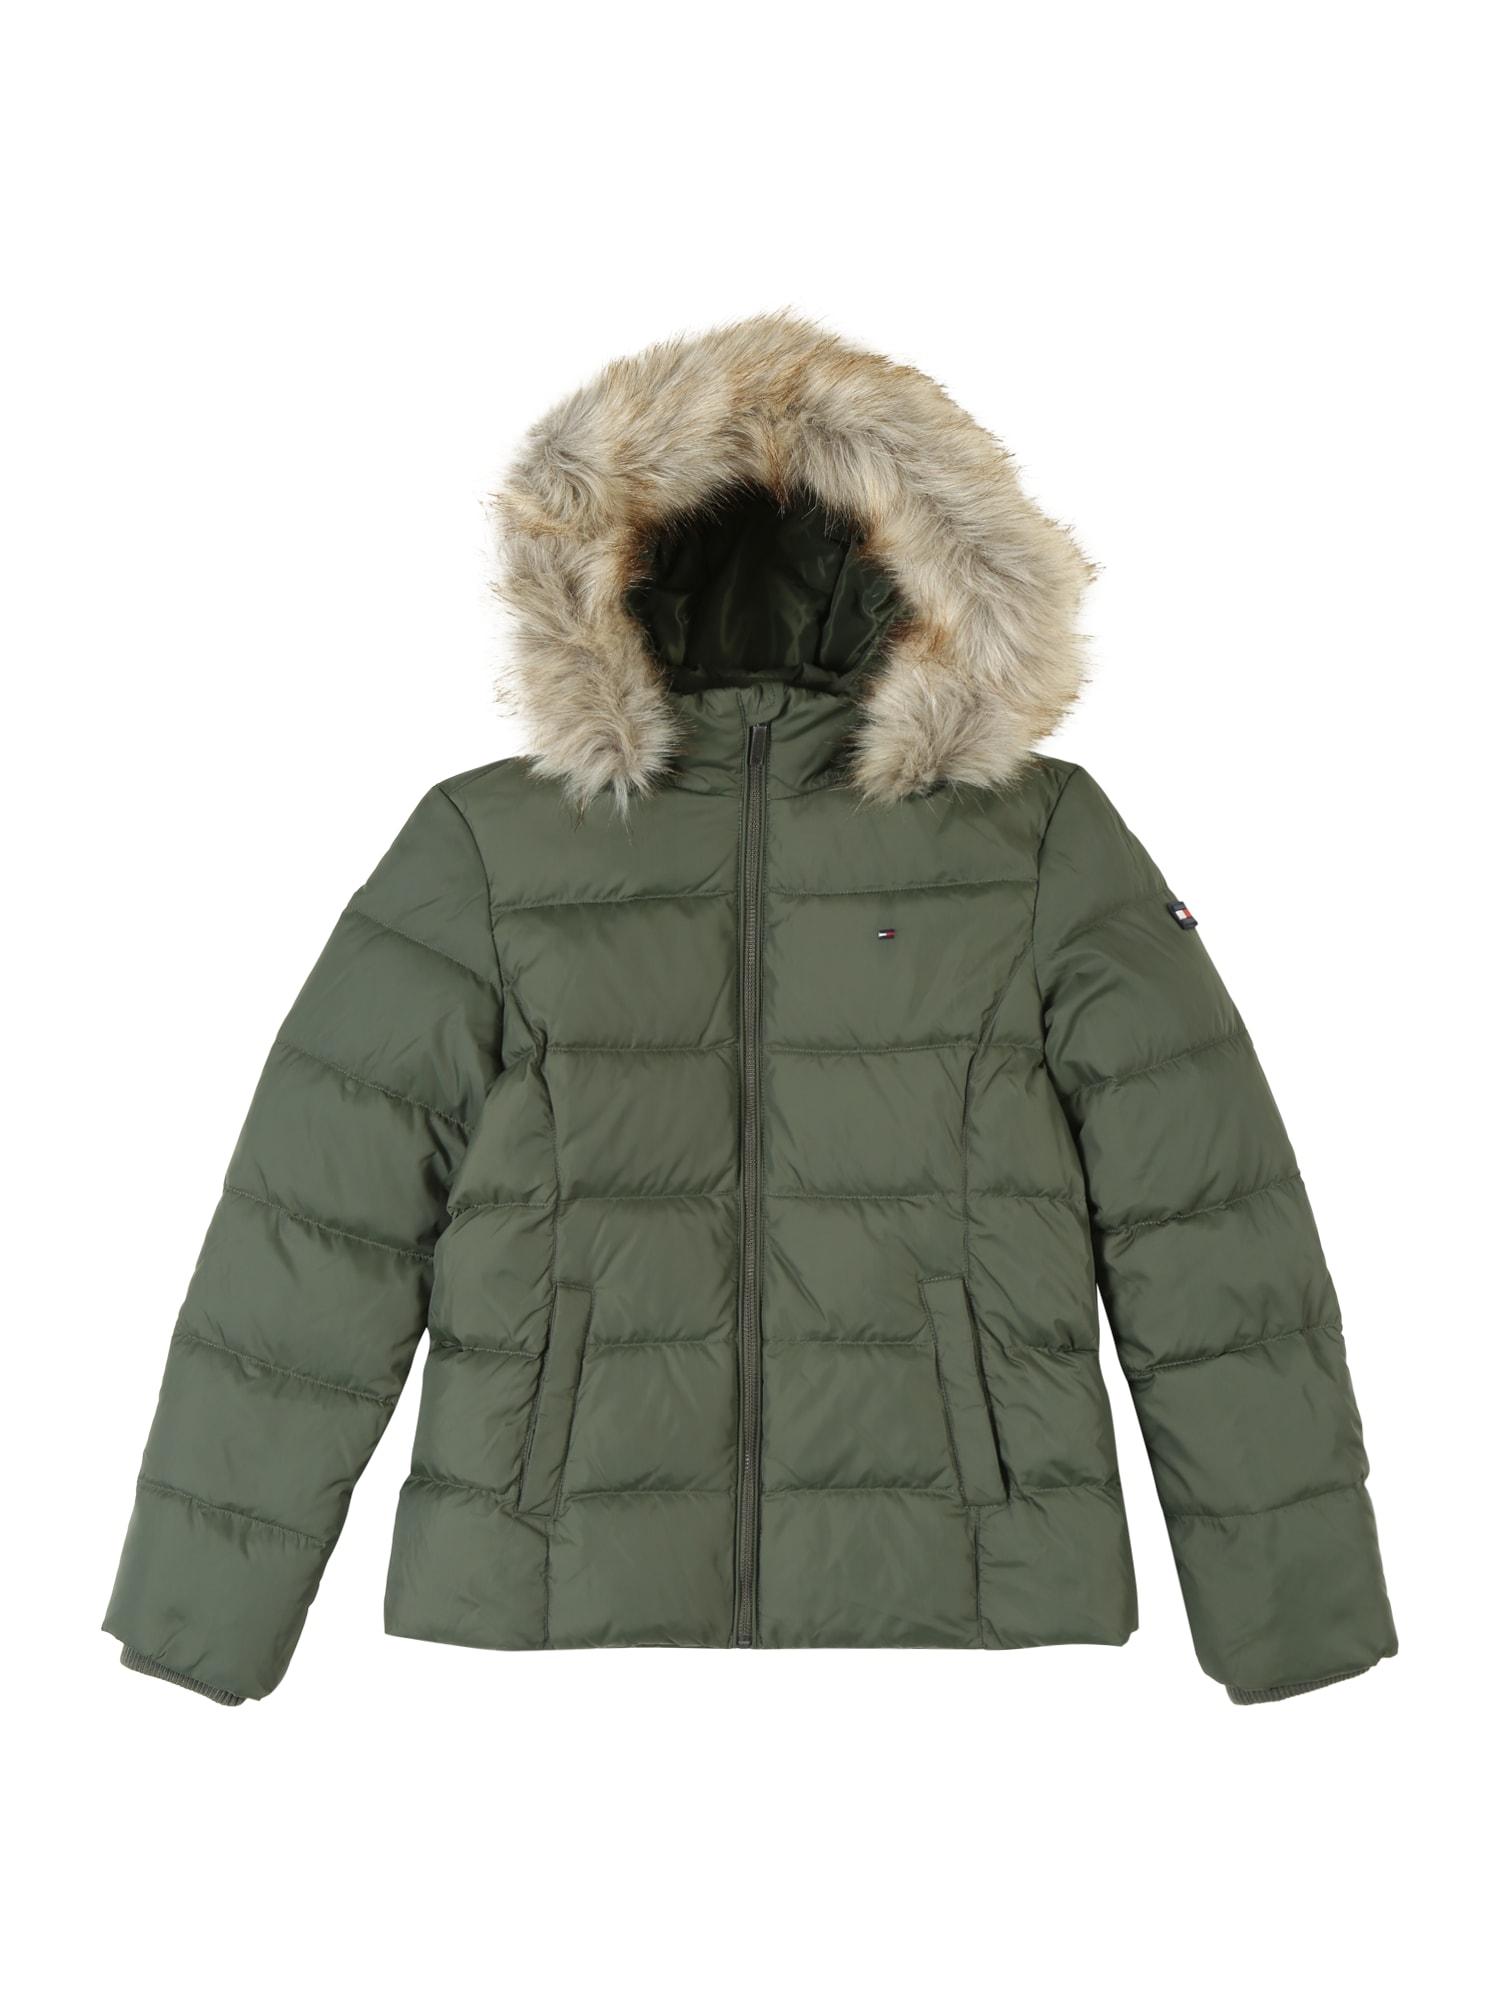 Přechodná bunda ESSENTIAL BASIC khaki TOMMY HILFIGER